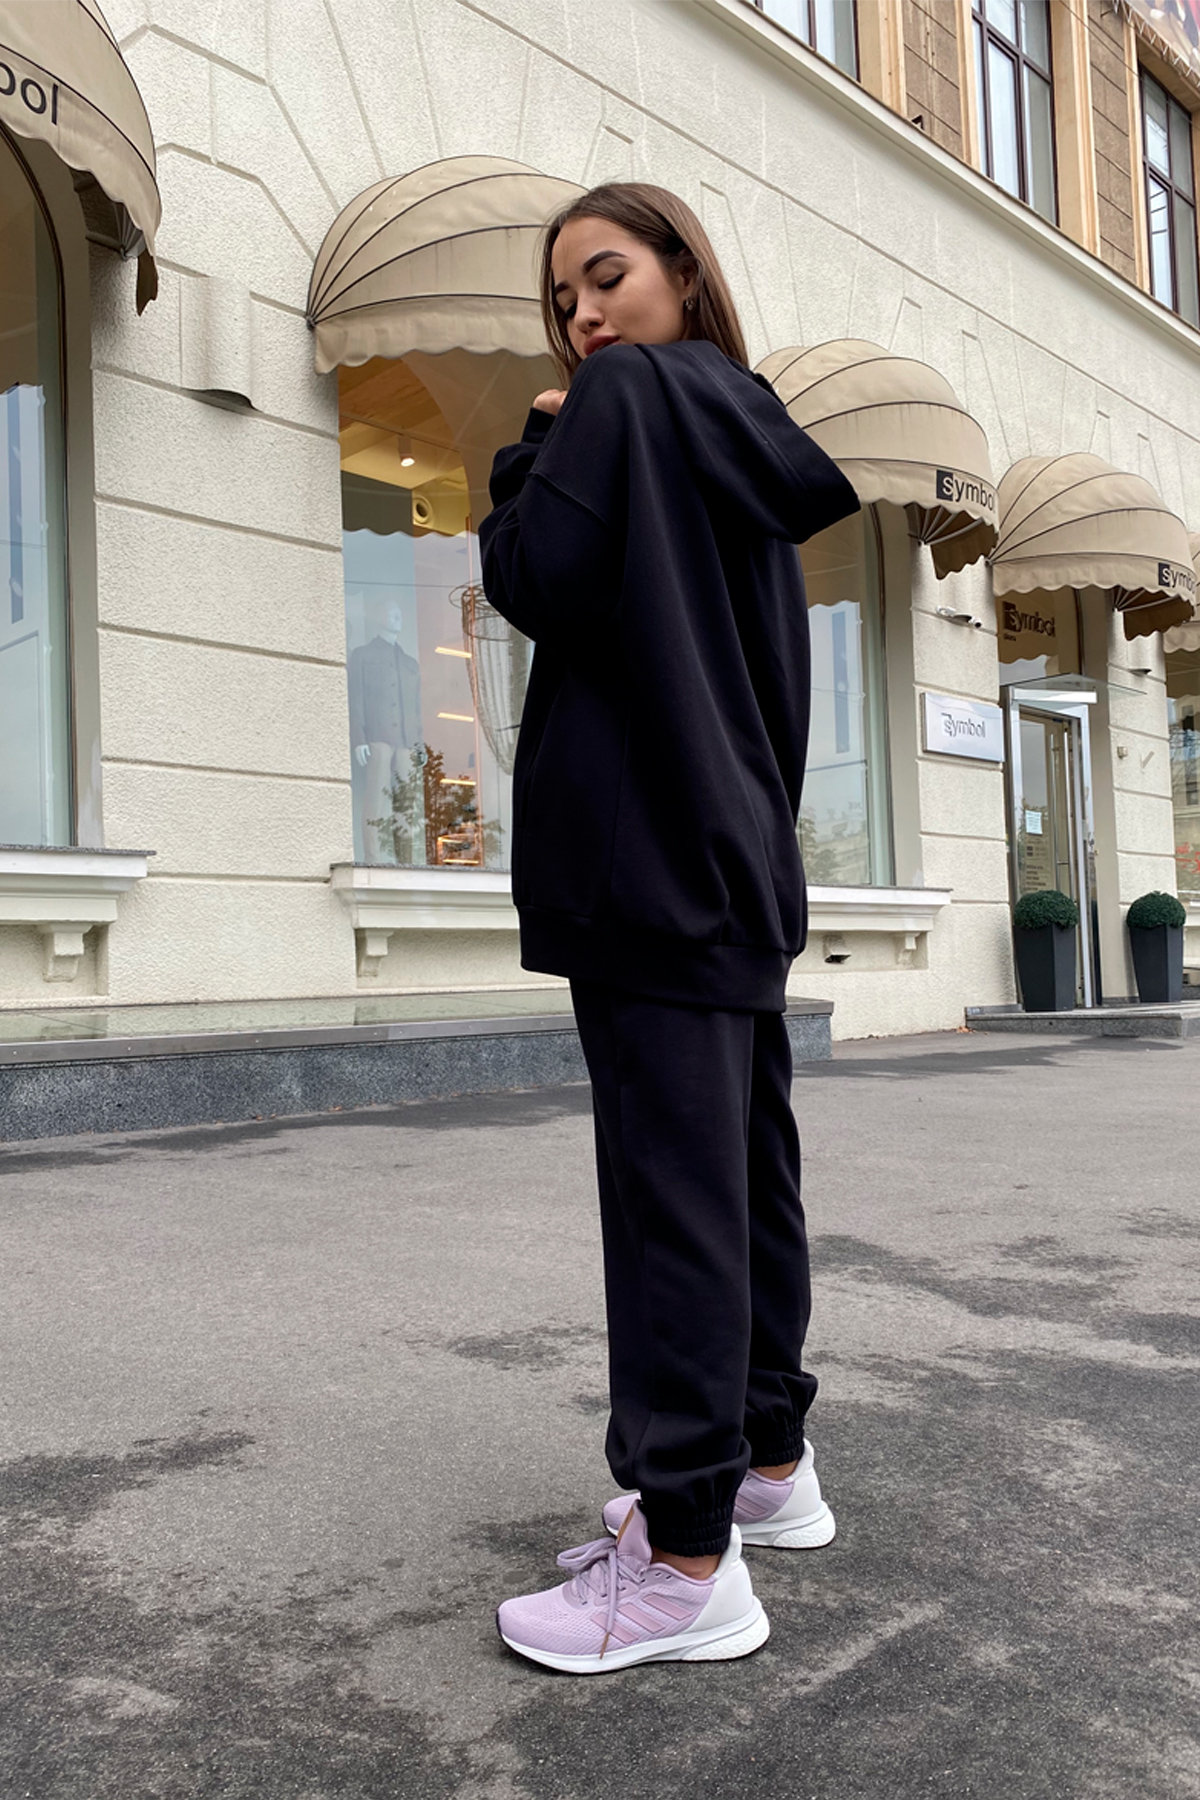 Марион Oversize трикотаж 3х нитка костюм 9533 АРТ. 45903 Цвет: Черный - фото 2, интернет магазин tm-modus.ru